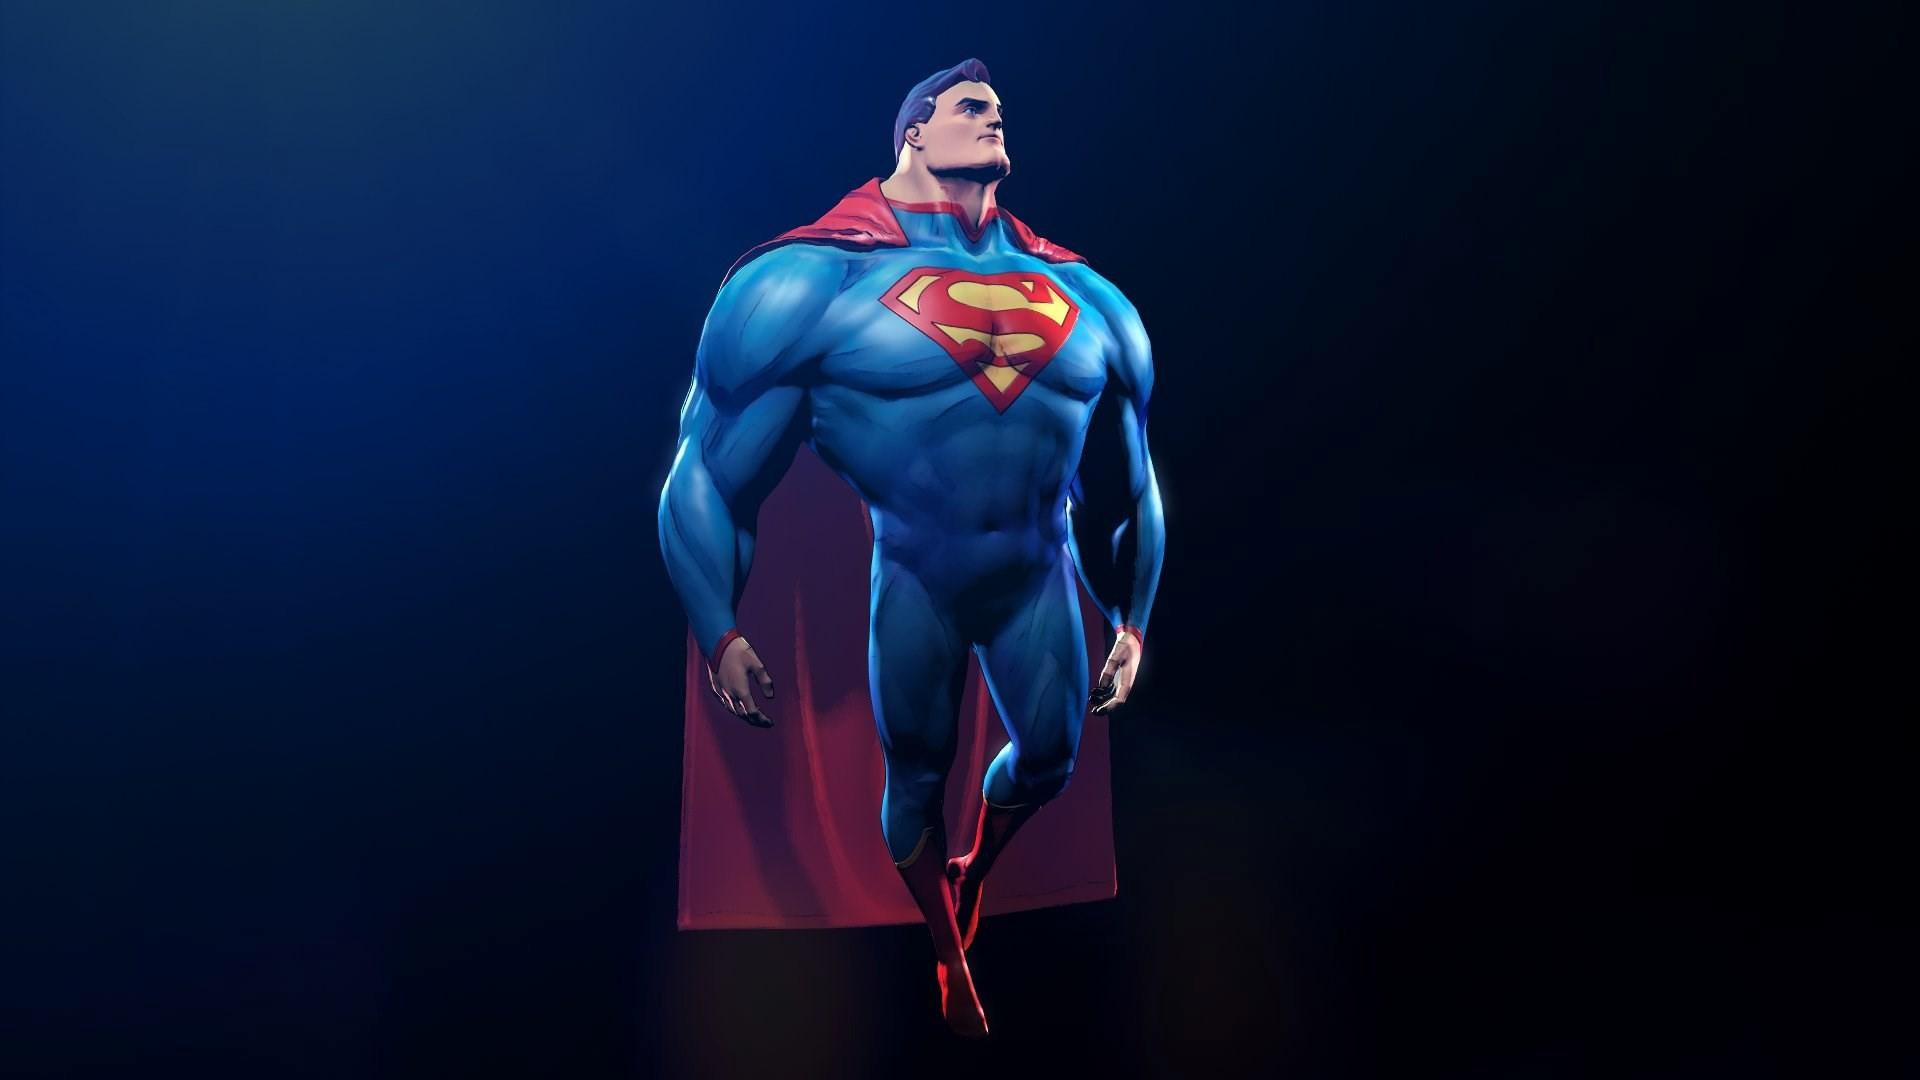 superman hd wallpapers 1080p windows